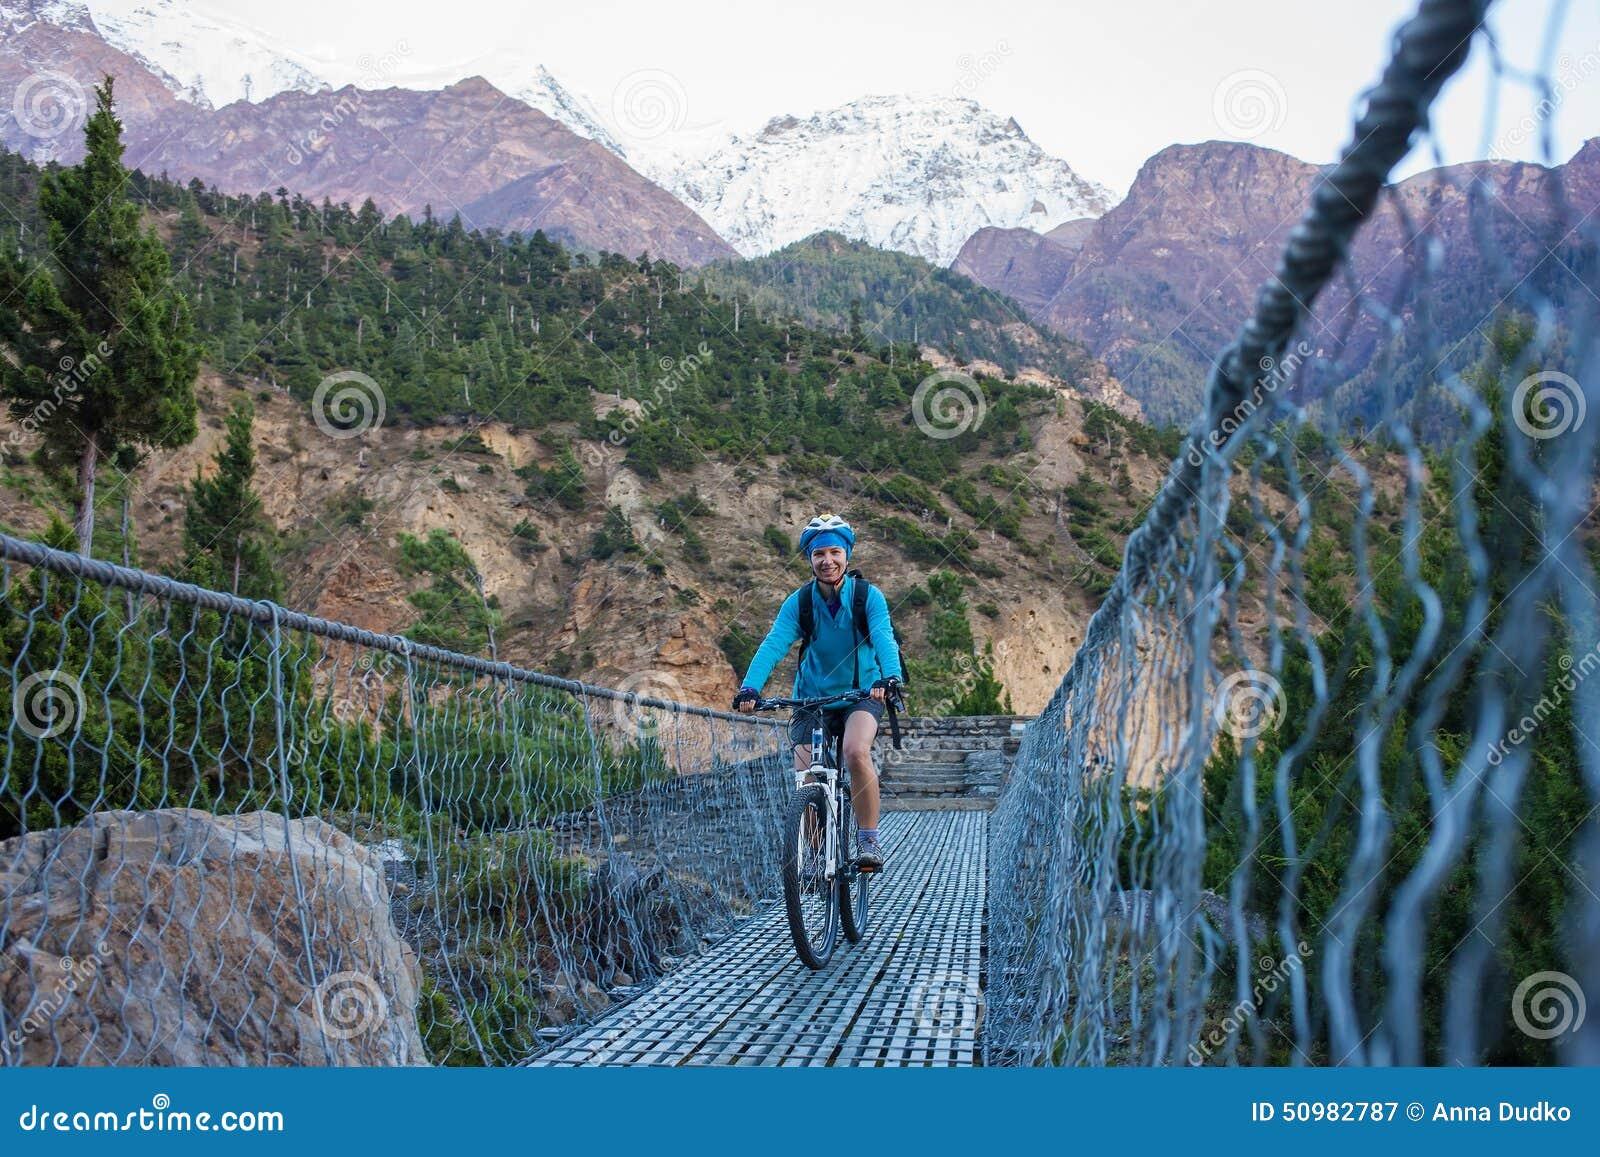 Biker-girl in Himalaya mountains